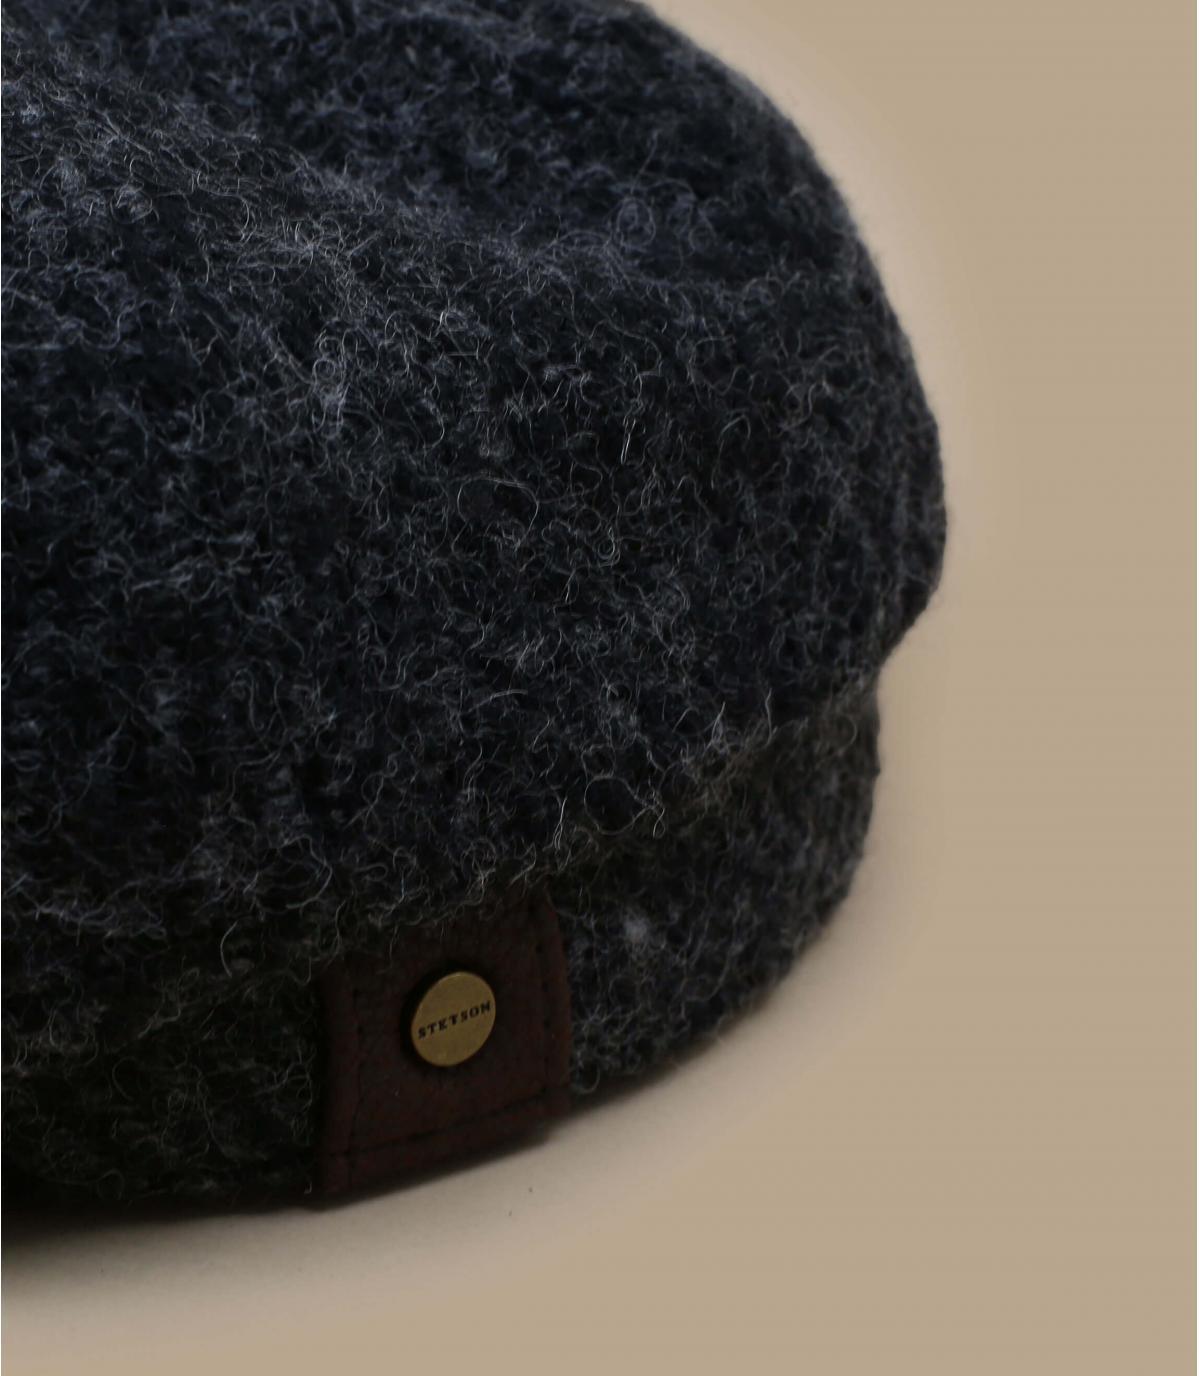 Barett schwarz winter Stetson